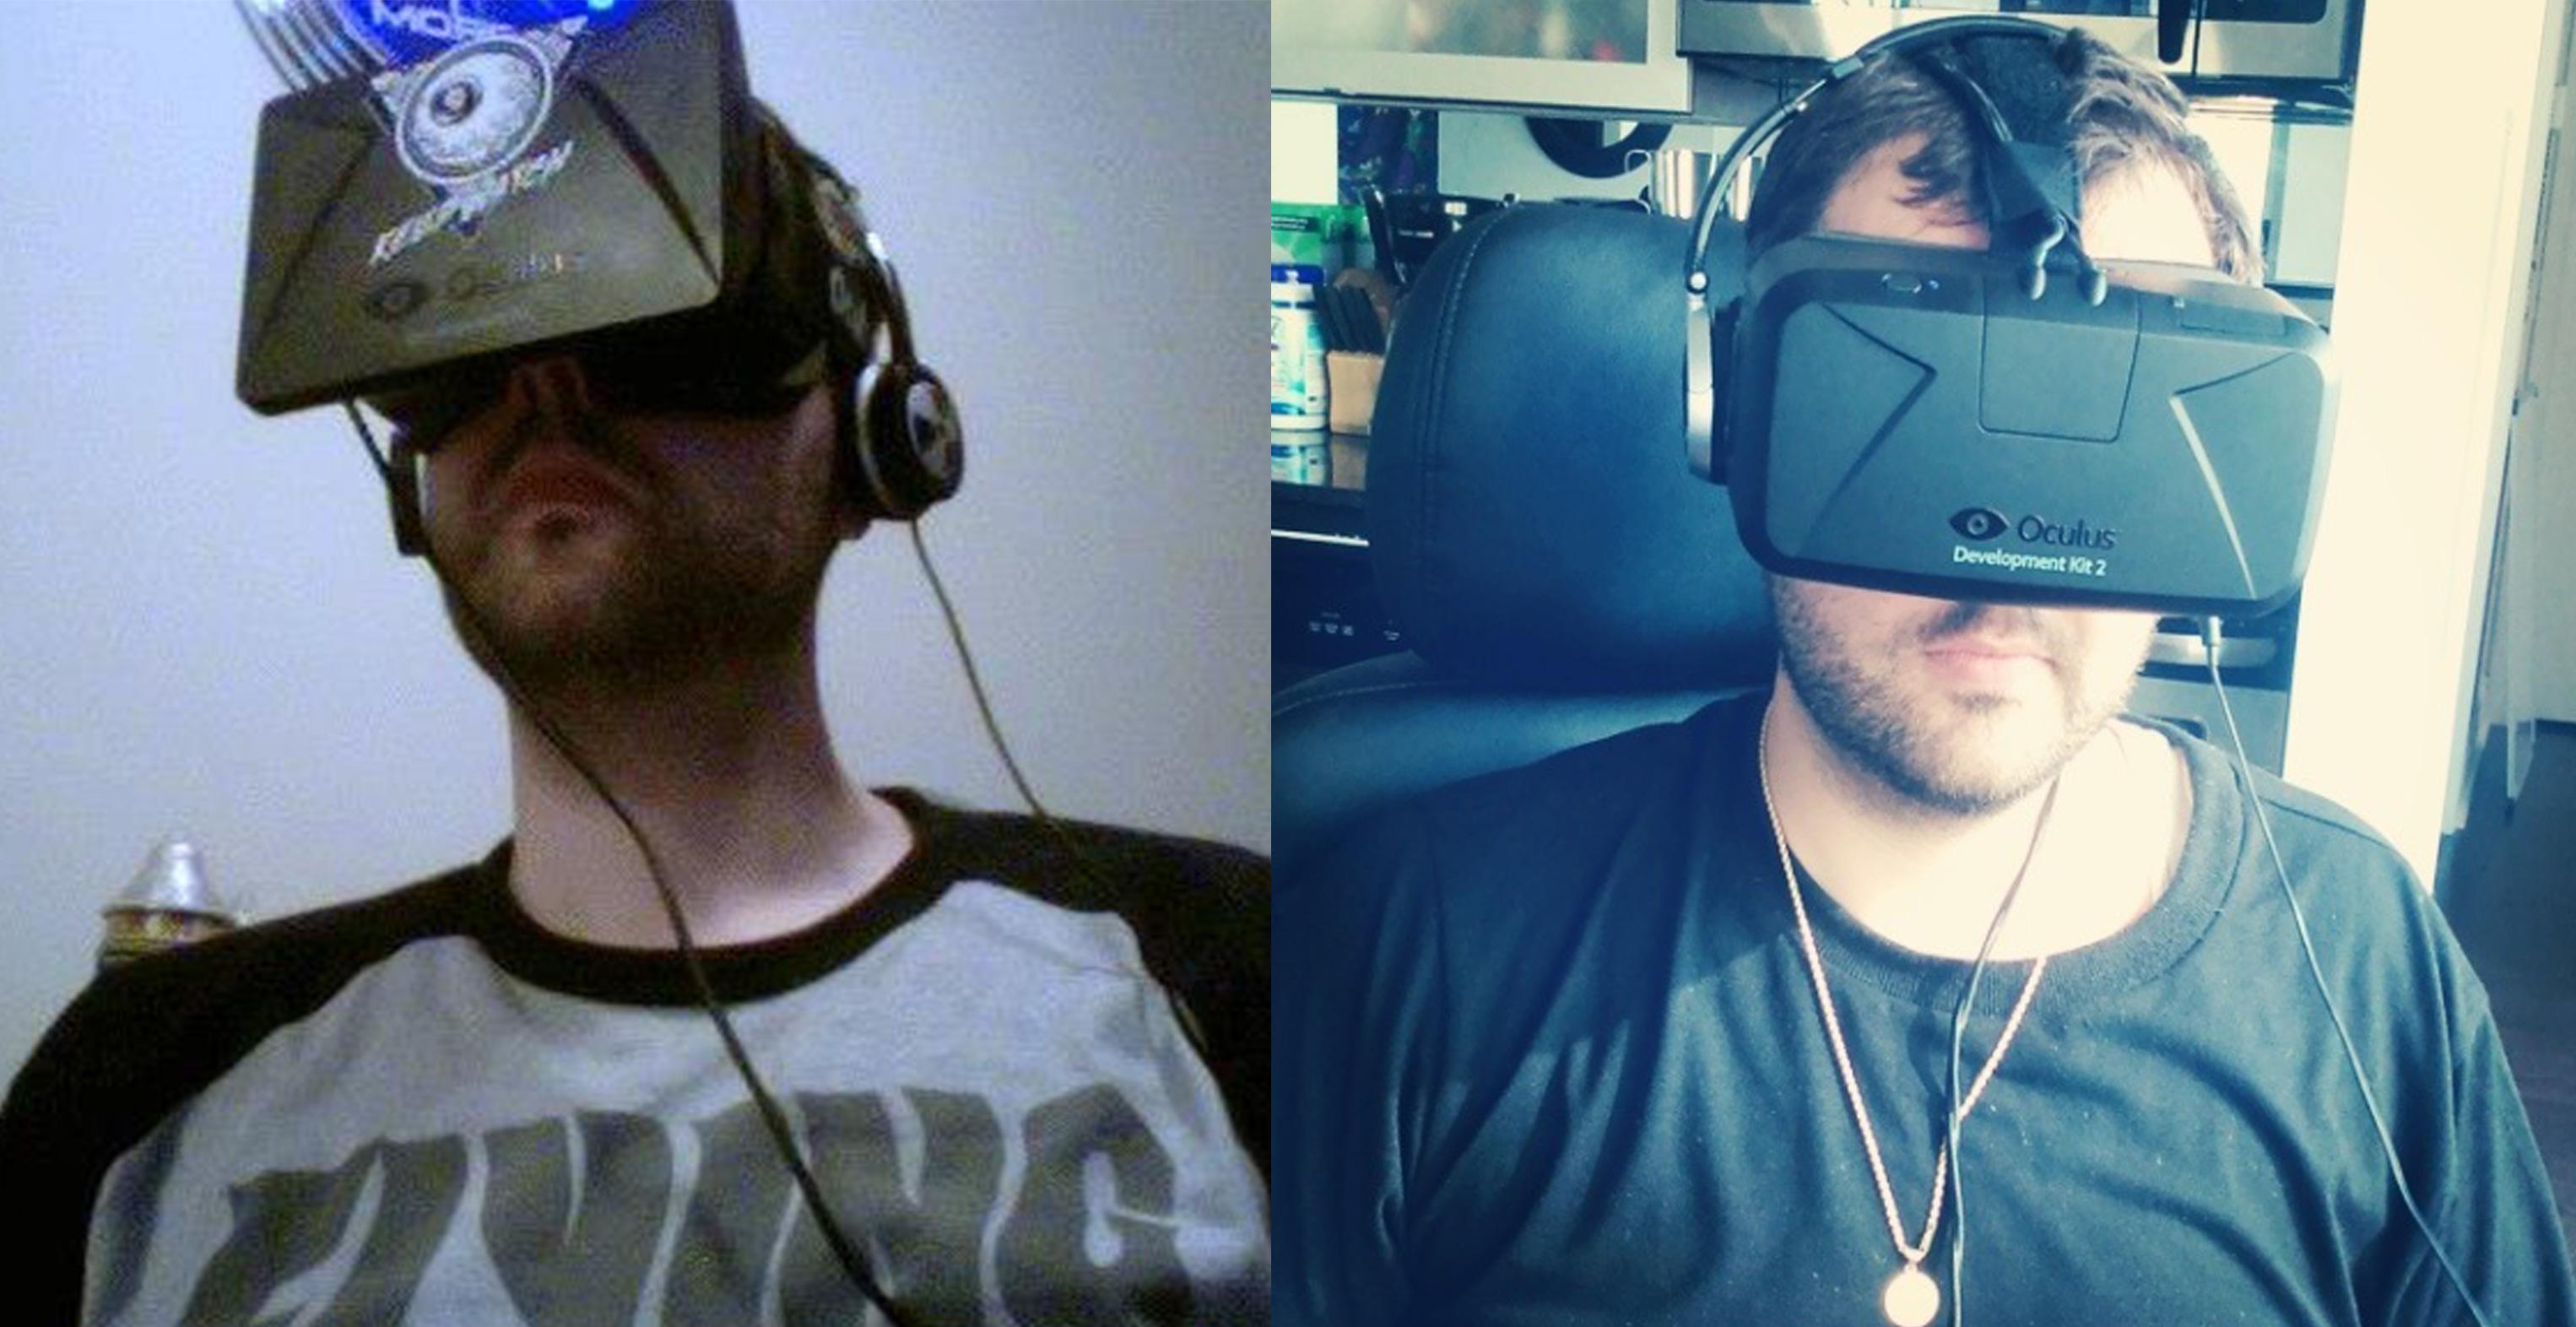 scott camball oculus vr